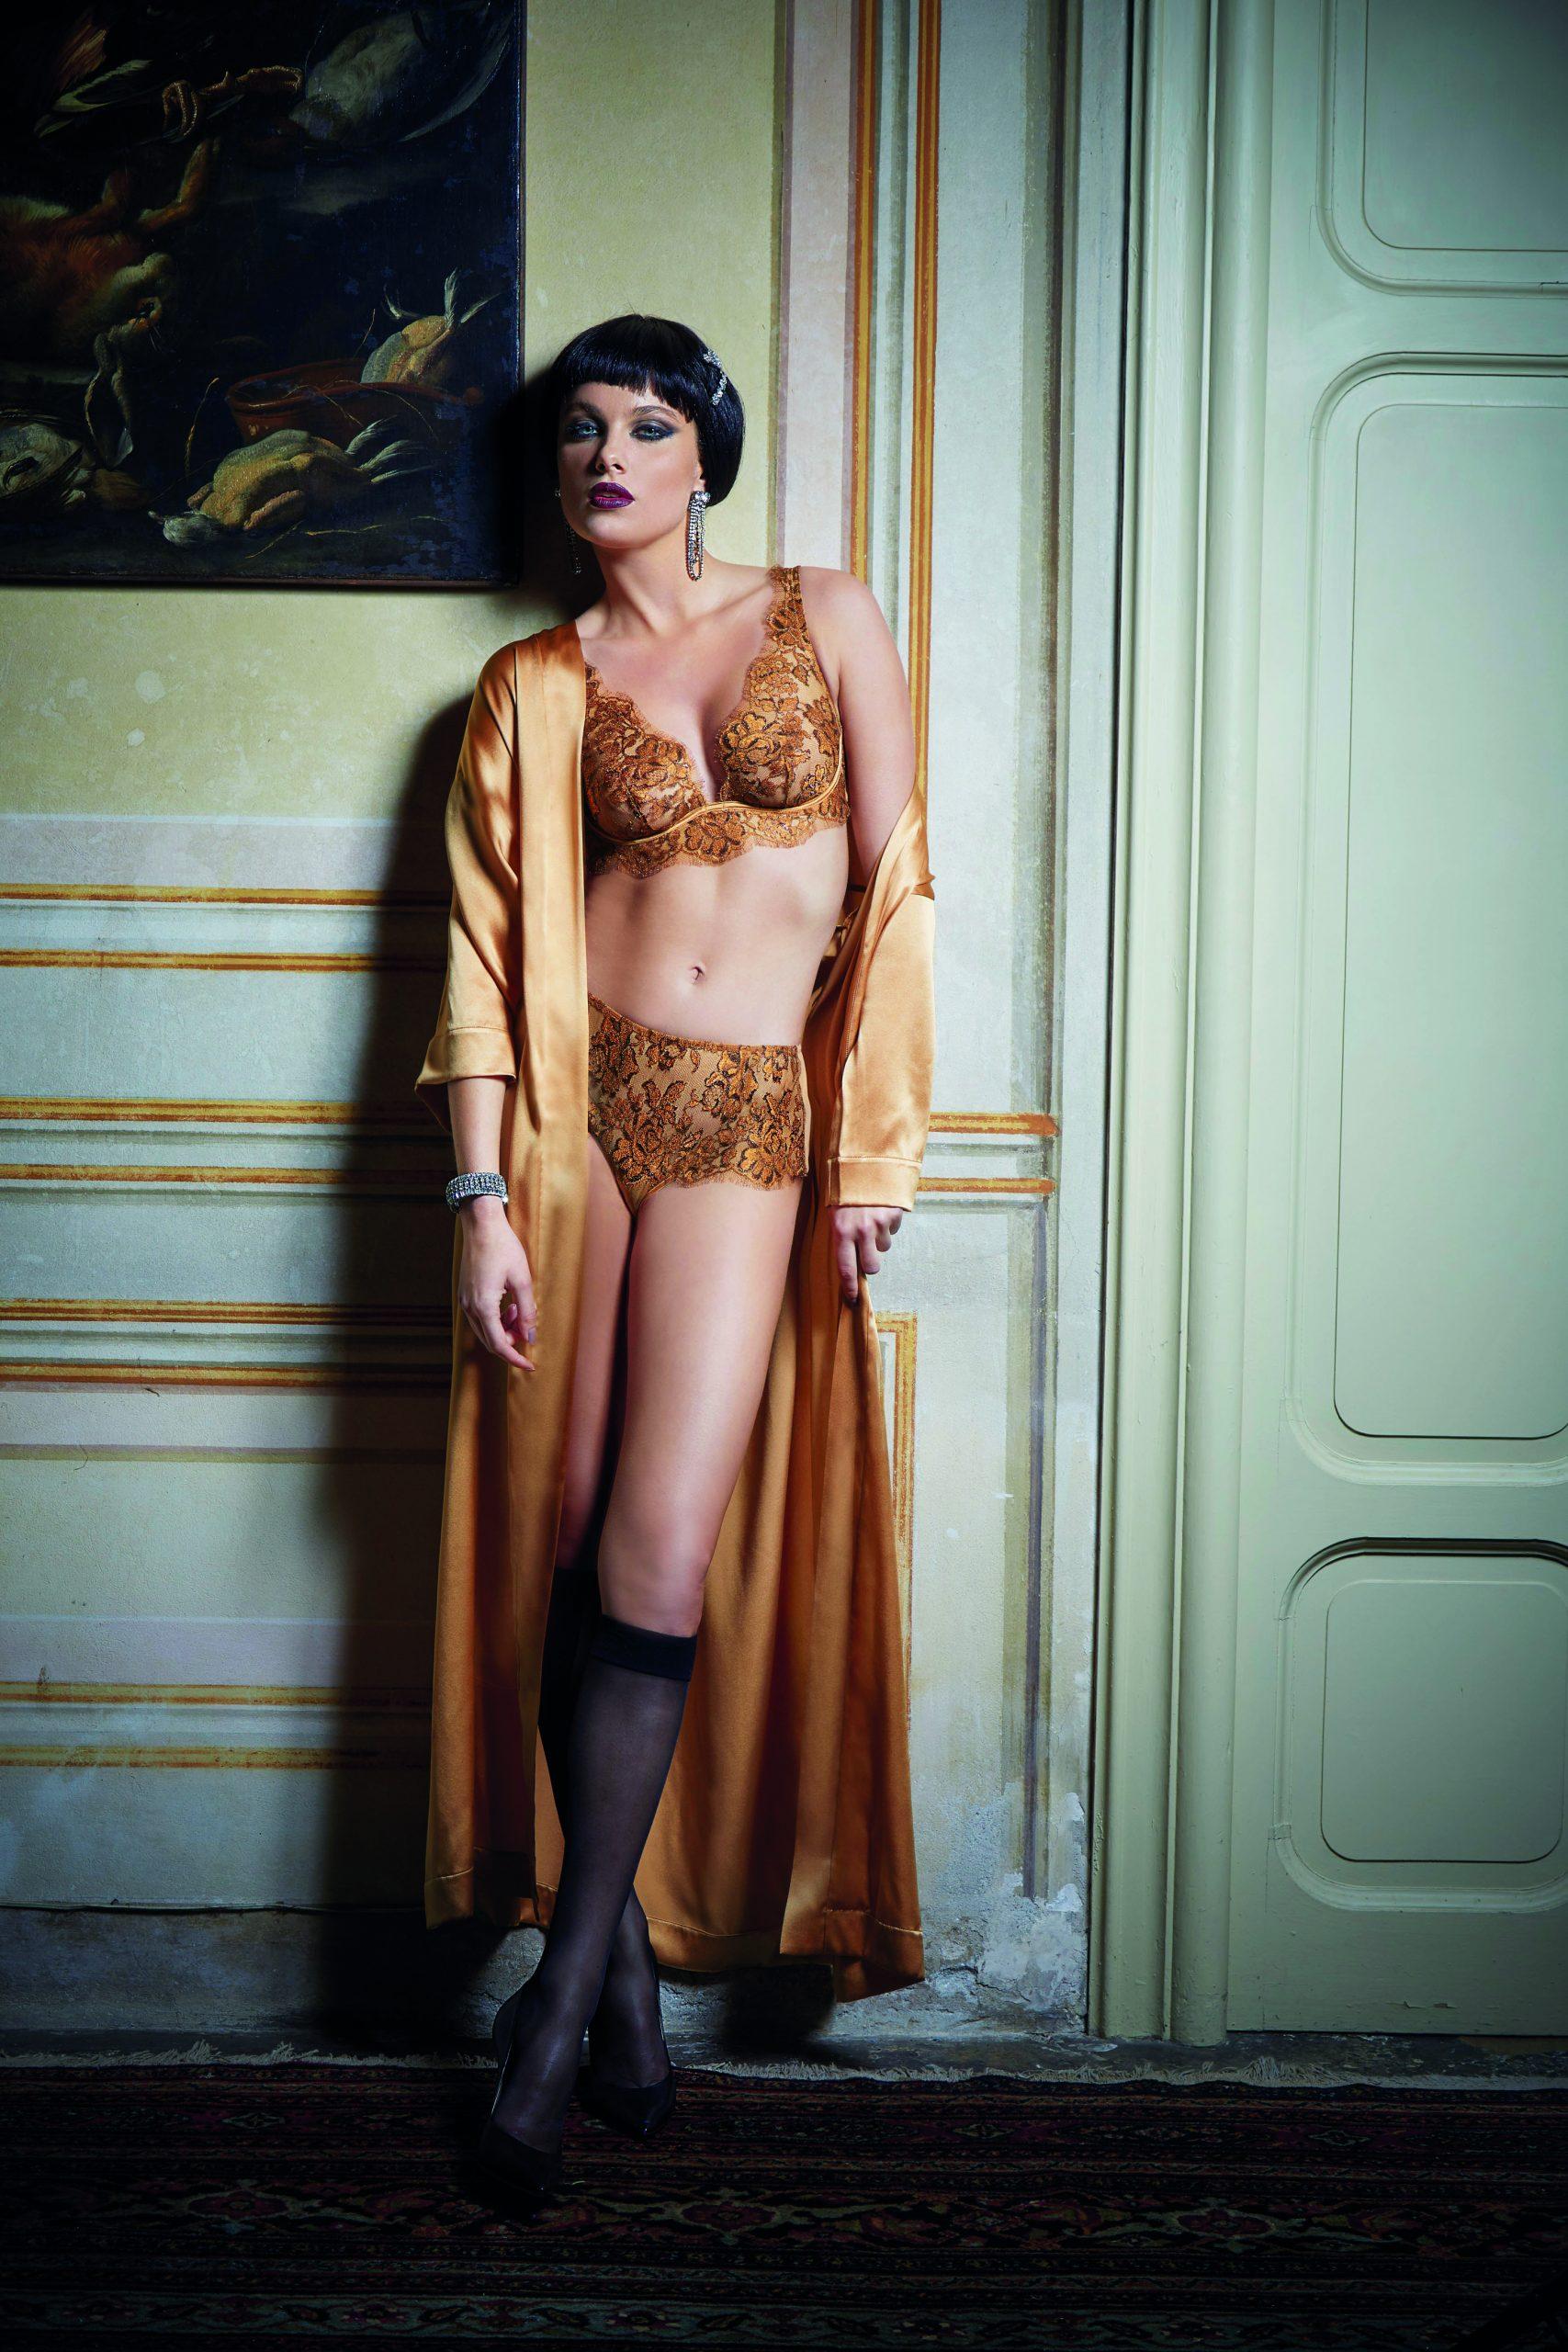 Valery_Prestige_Lingerie_Cognac